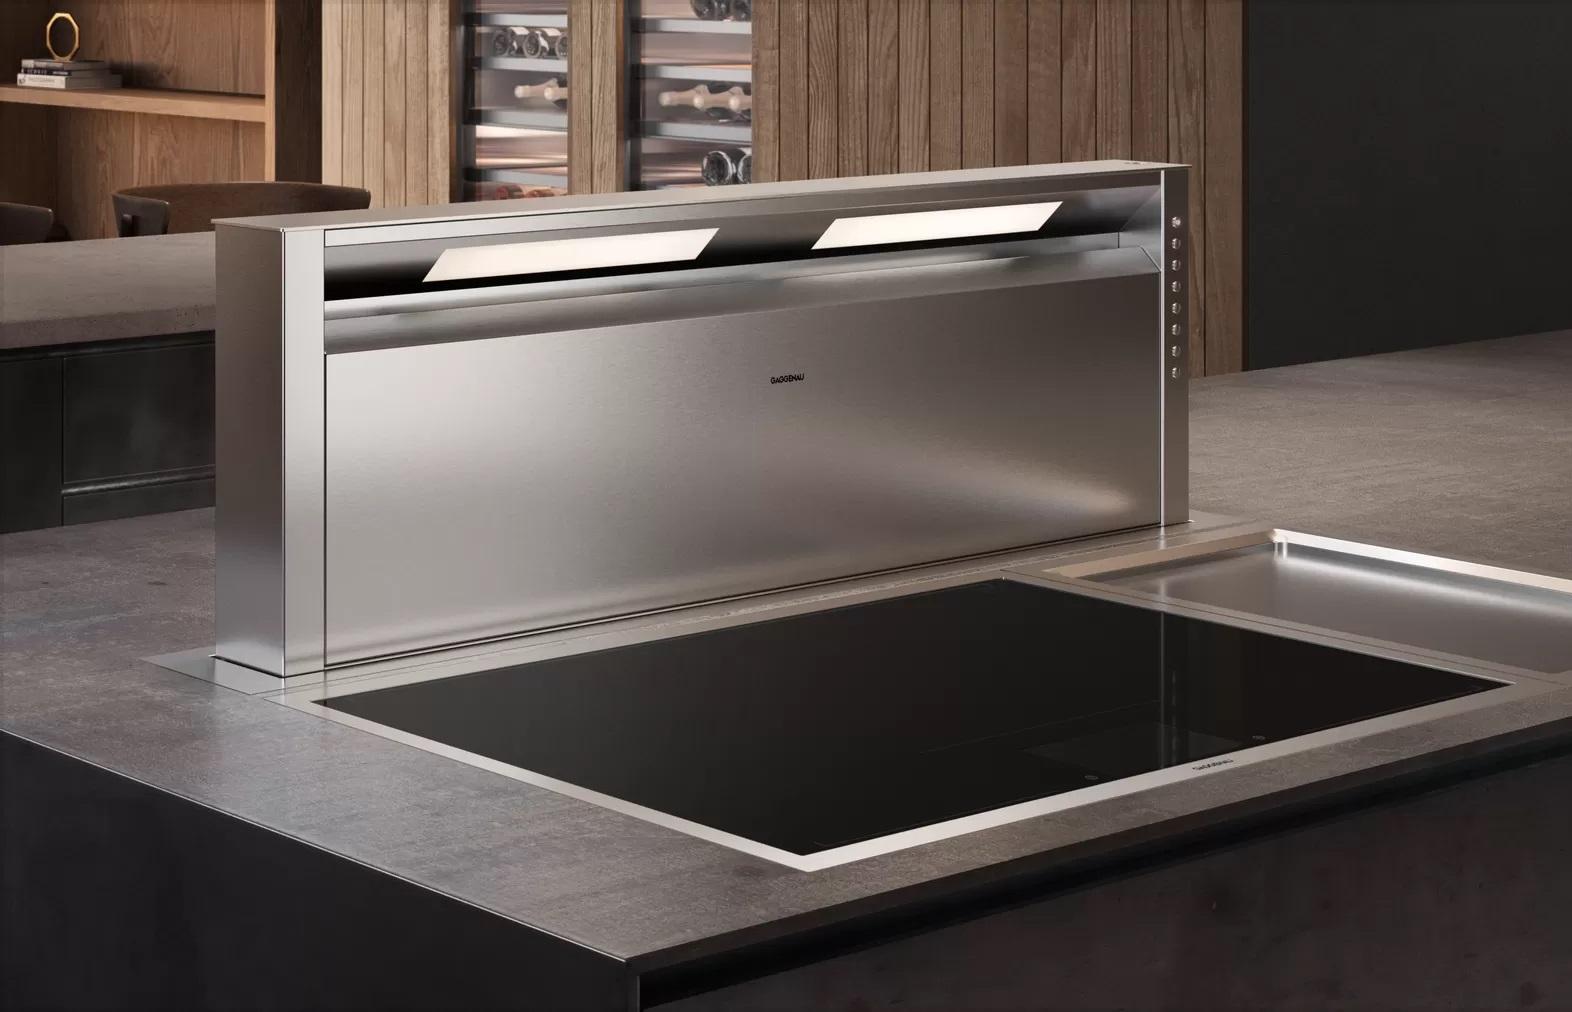 Table ventilation 400 series